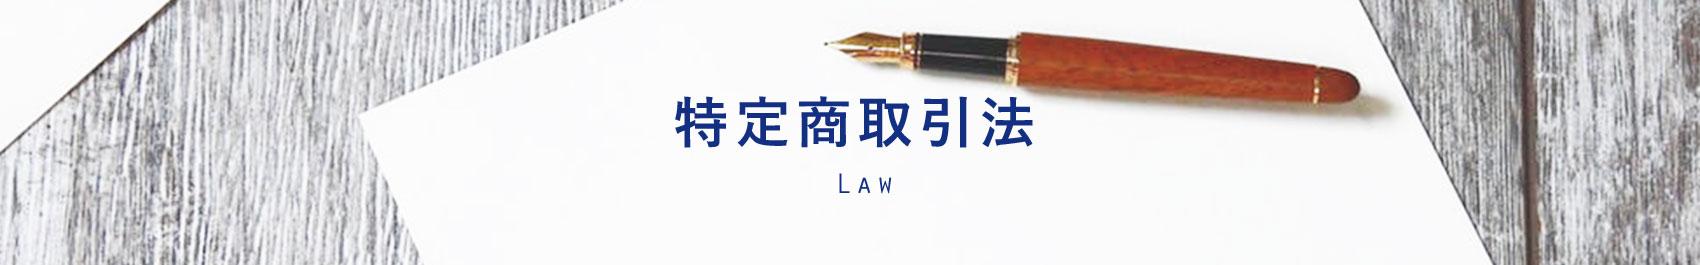 特定商取引法LAW